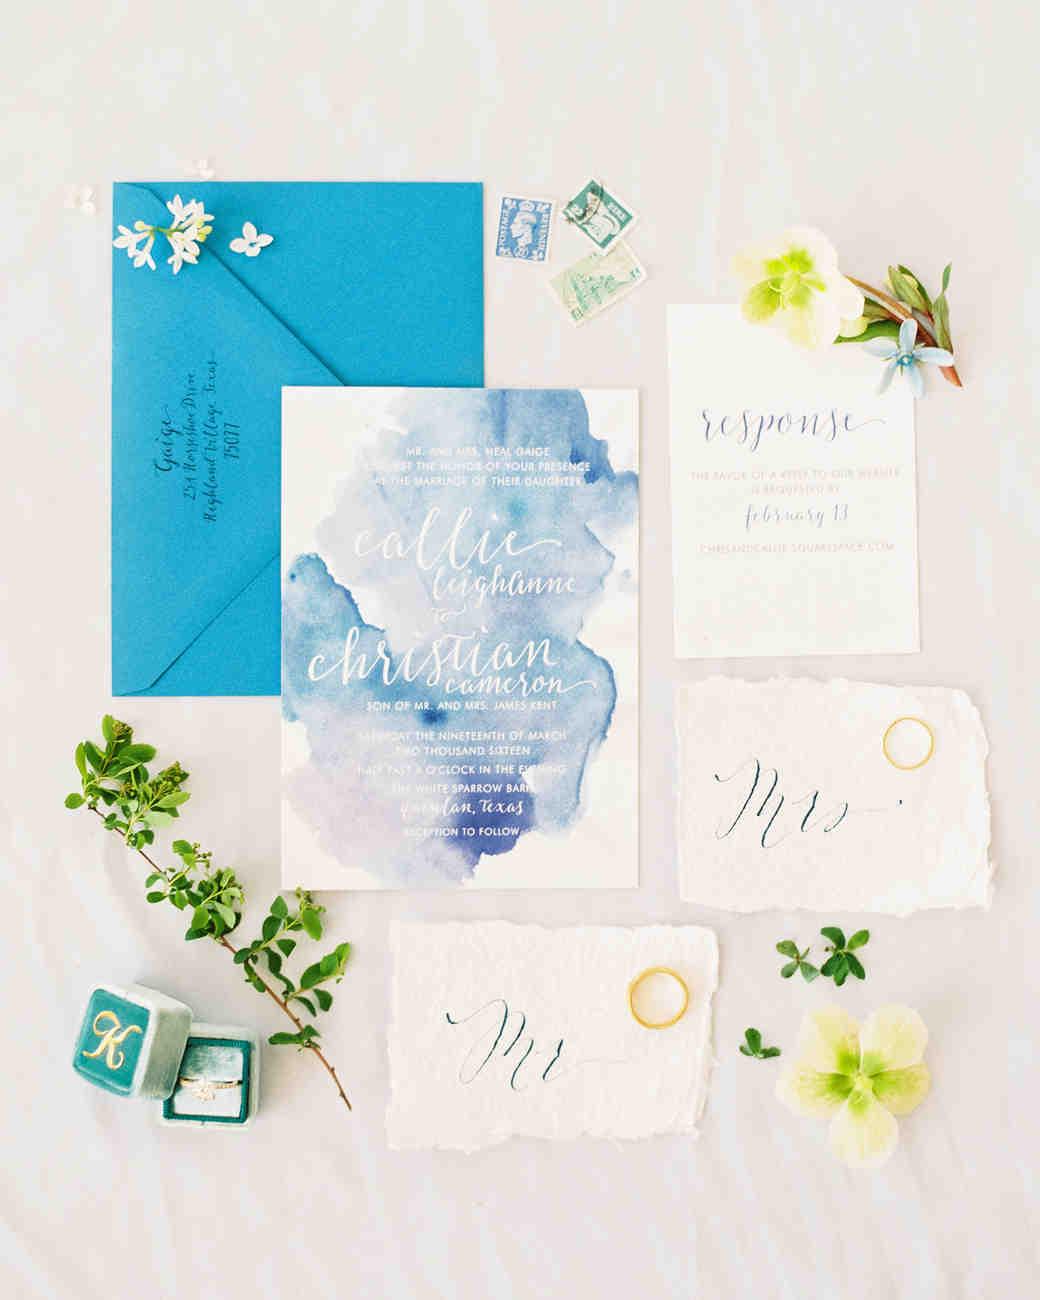 watercolor-wedding-invitations-becca-lea-photography-0717_vert.jpeg